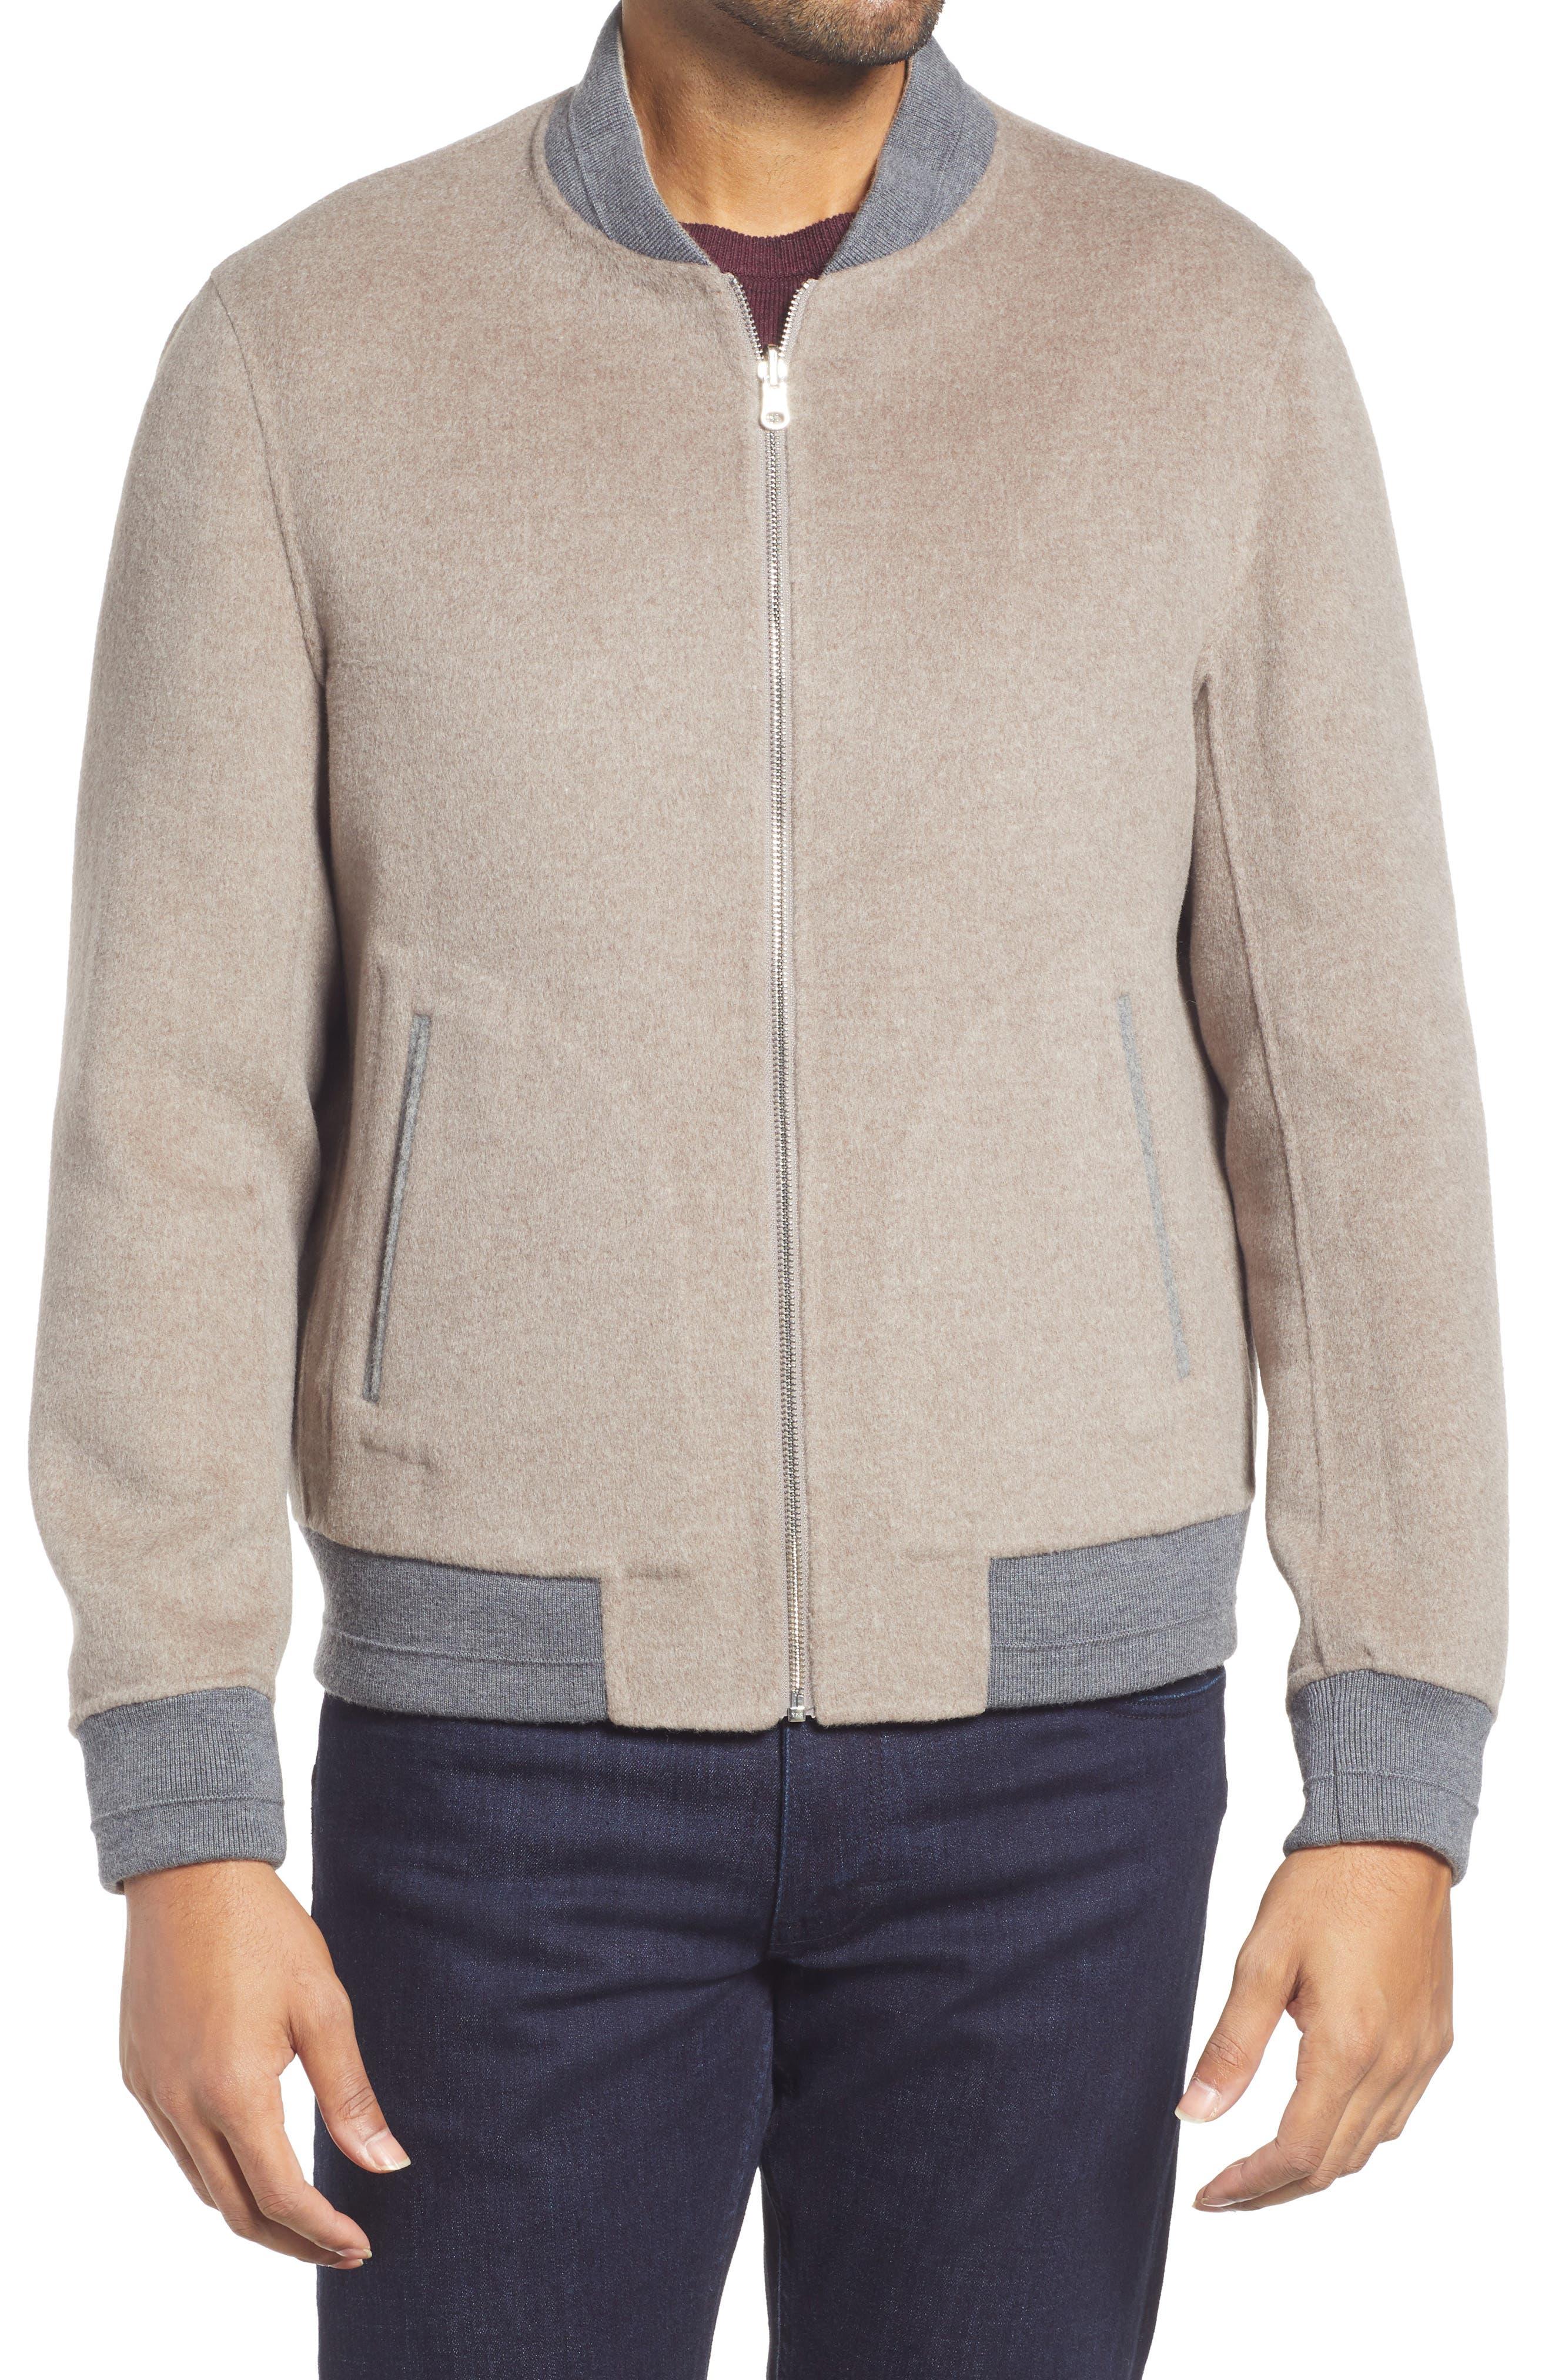 Brady Wool & Cashmere Reversible Bomber Jacket